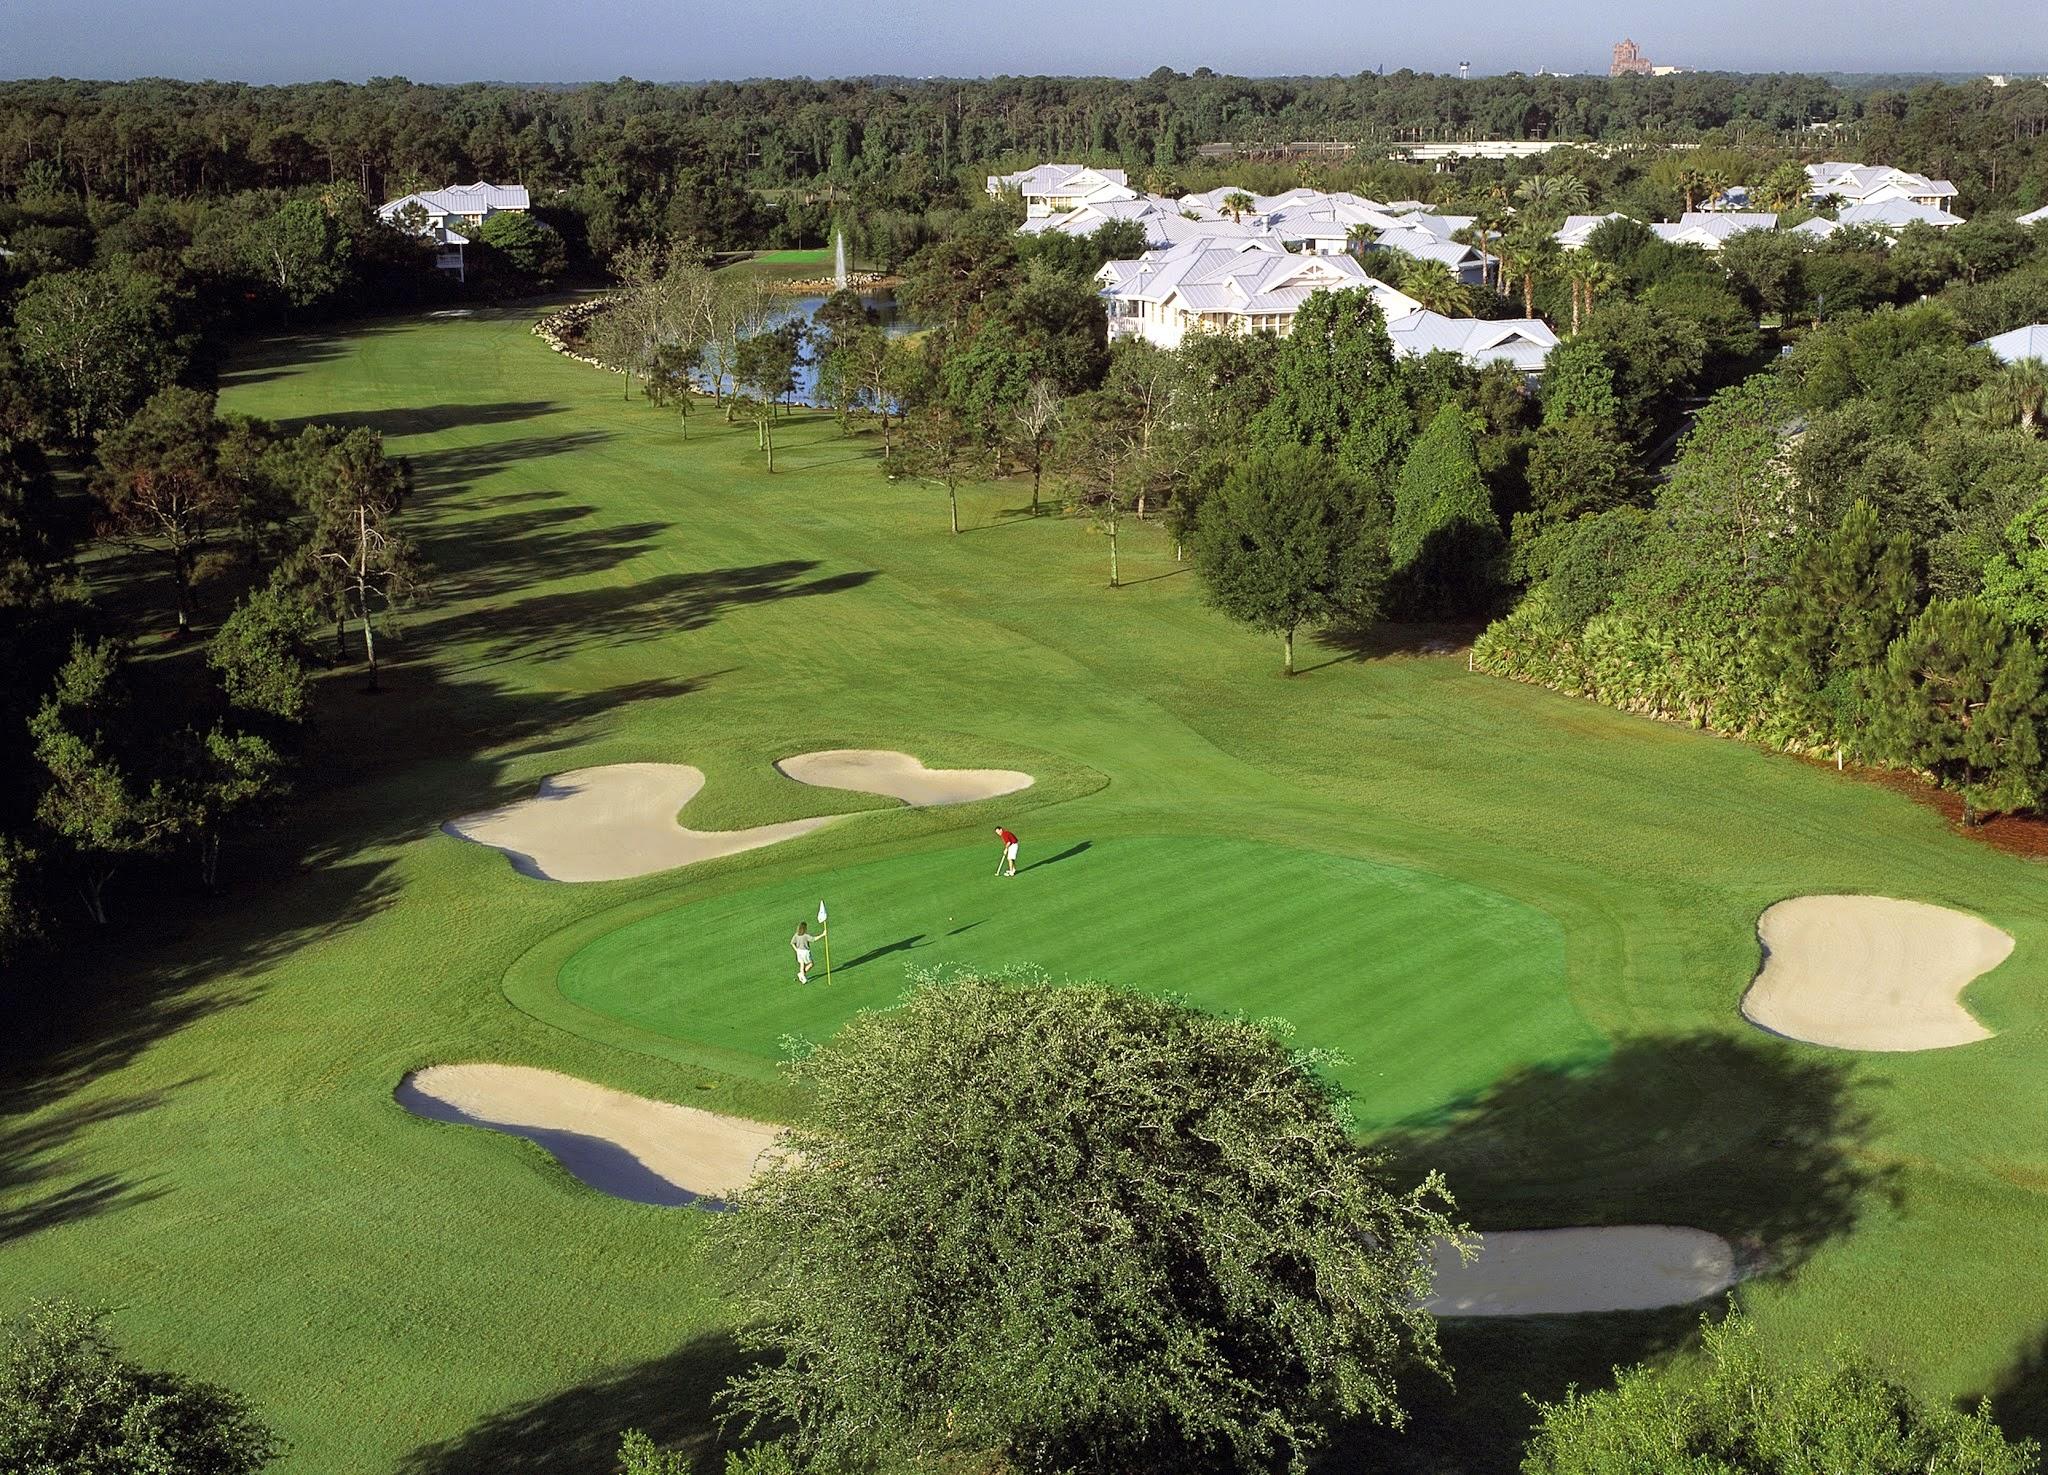 Disney's Lake Buena Vista Golf Course image 1